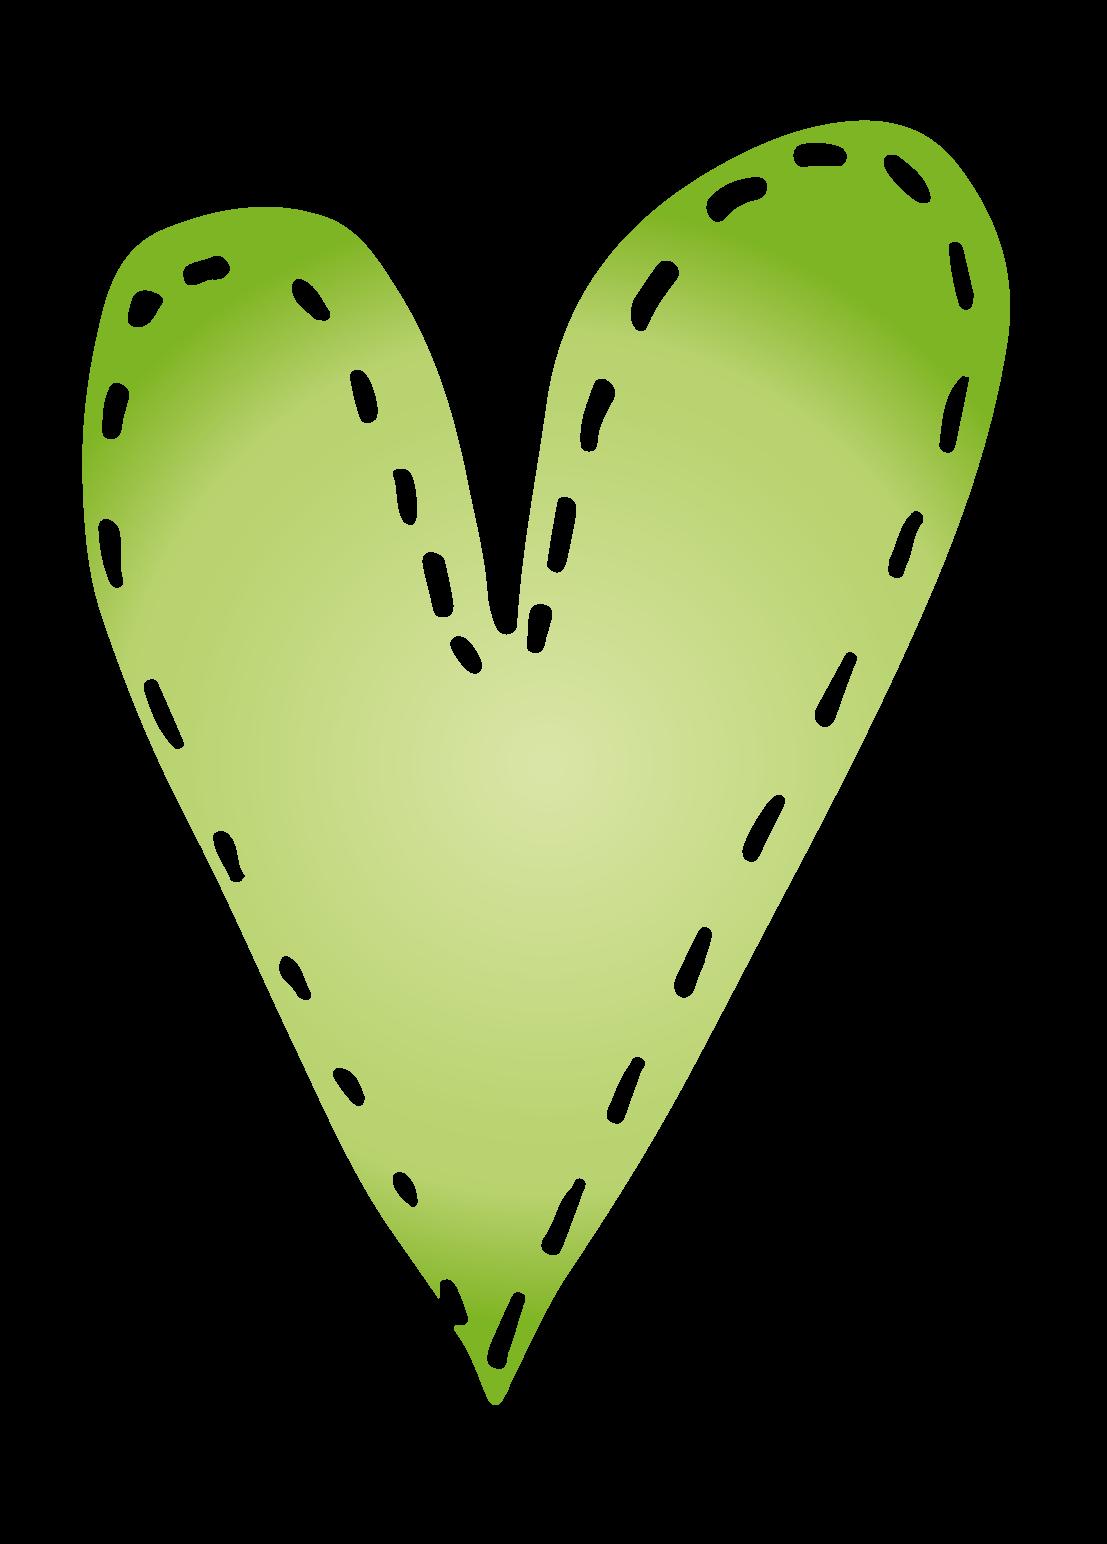 Melonheadz heart clipart jpg stock Image result for melonheadz heart   Melonheadz Clipart   Pinterest ... jpg stock